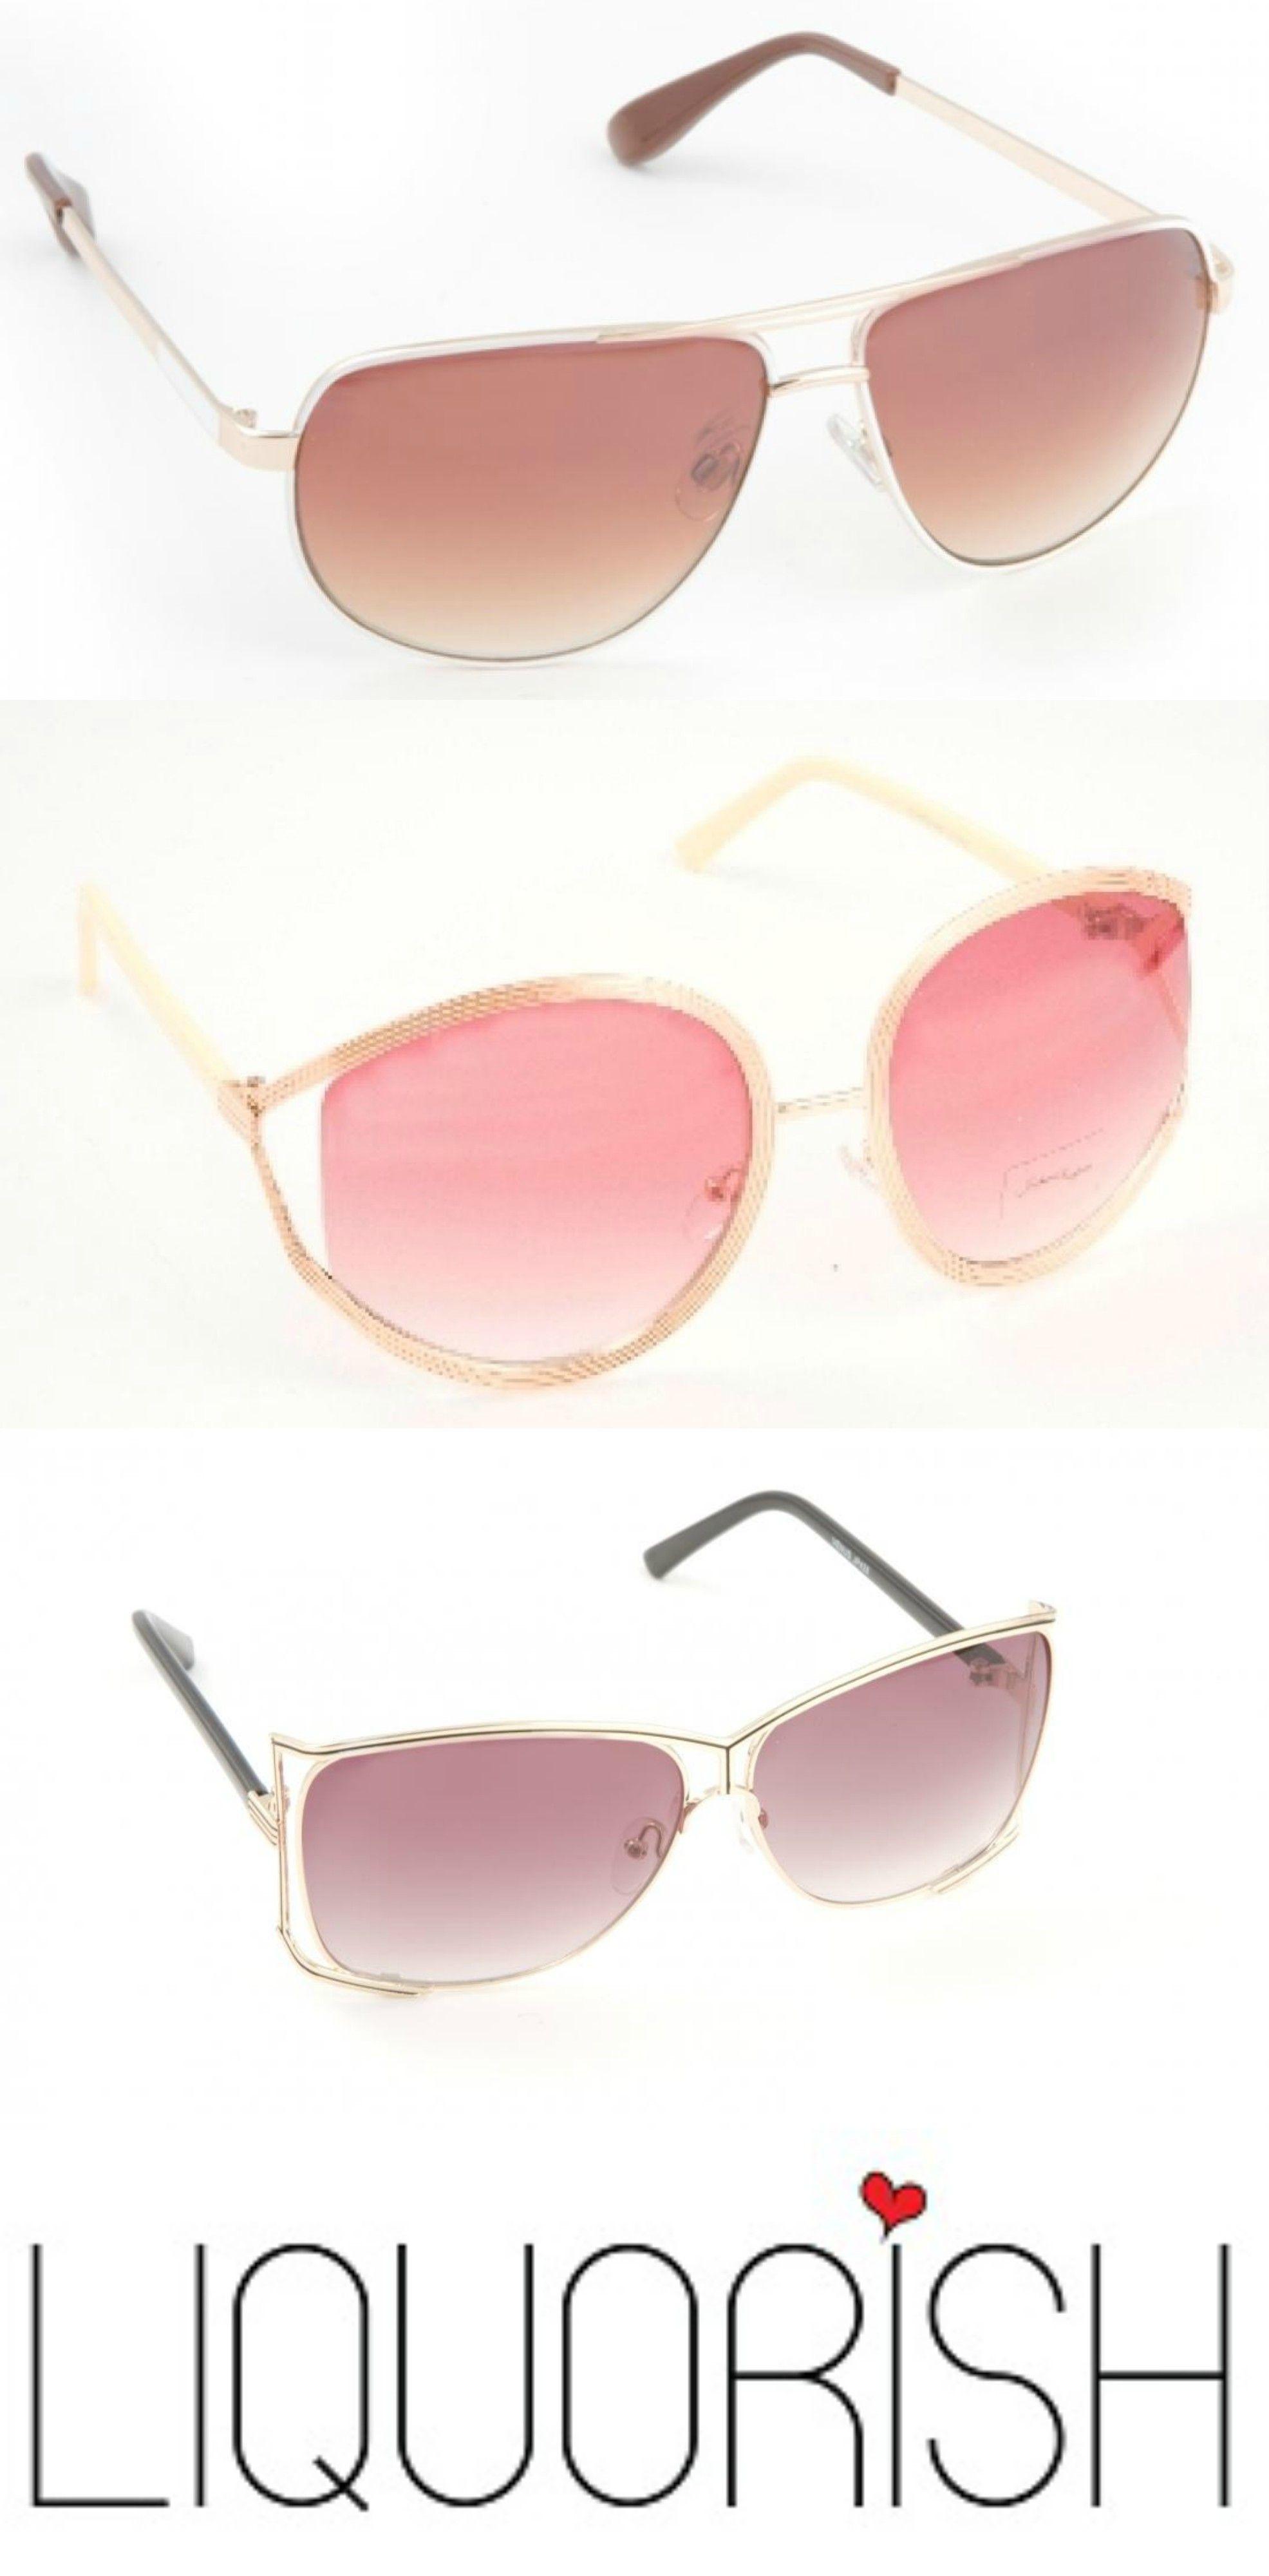 dea1fc77881 Jeepers Peepers! Liquorish sunglasses